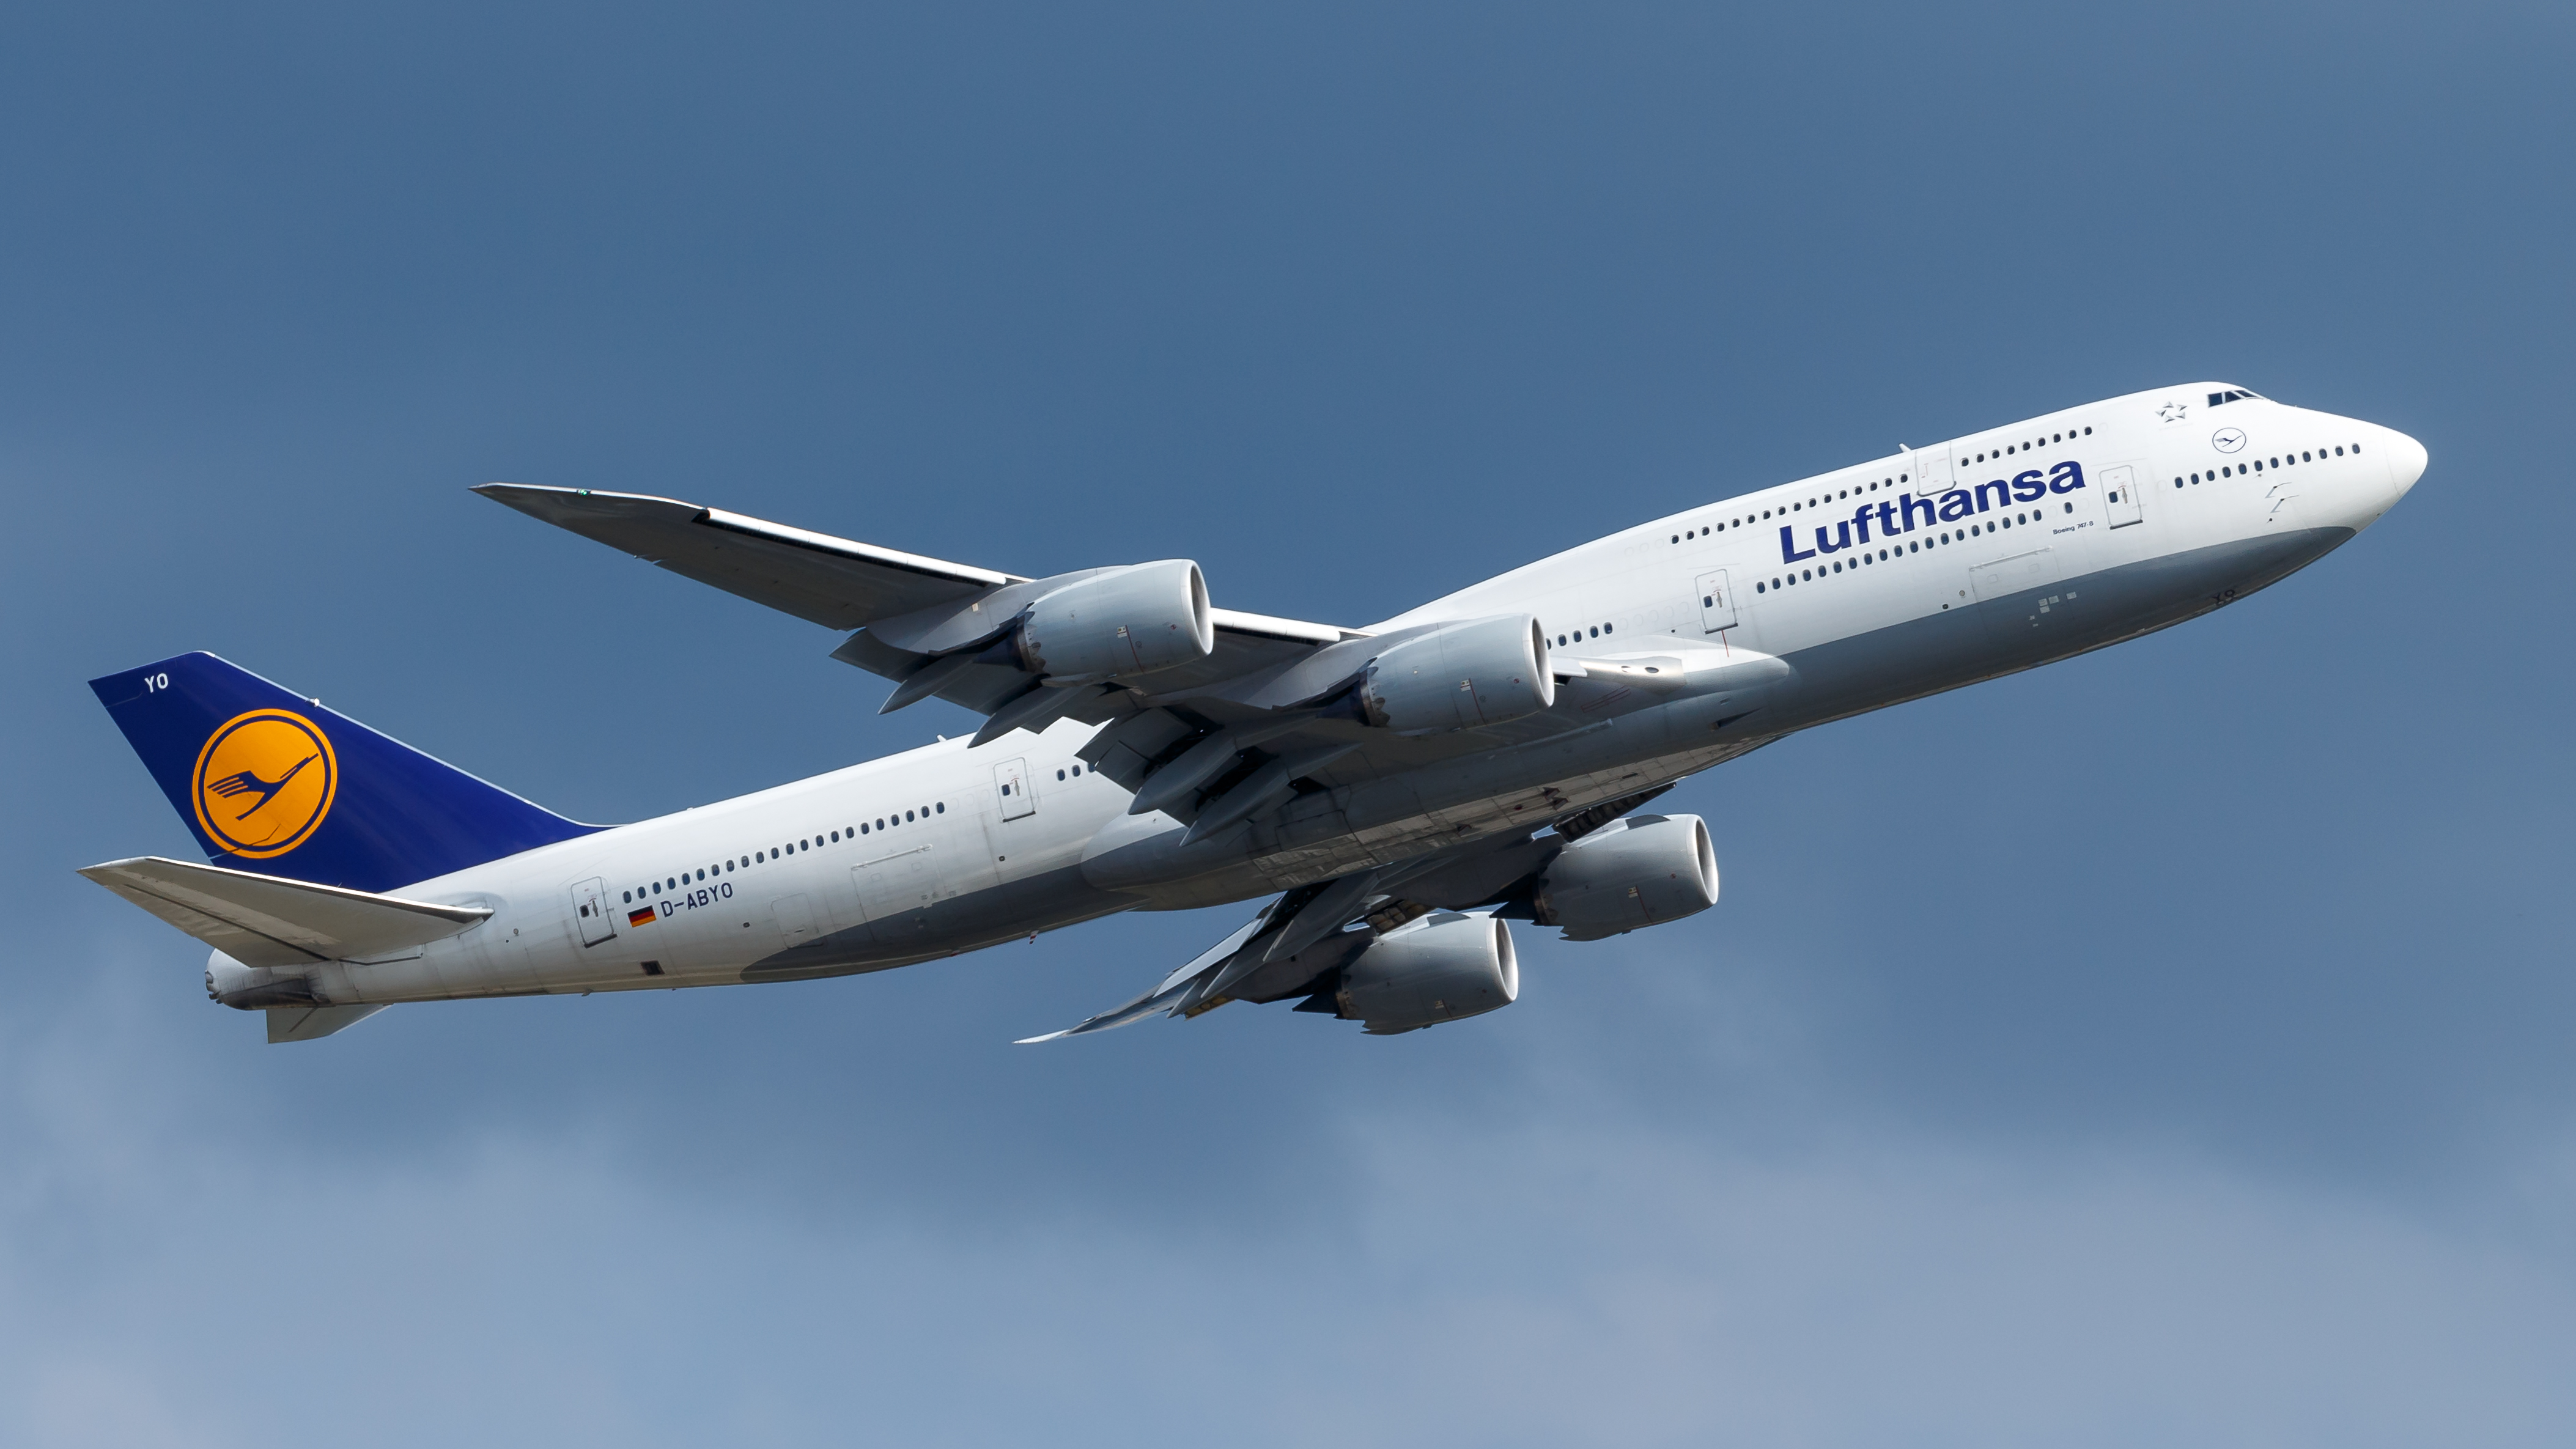 Lufthansa_Boeing_747-8_(D-ABYO)_at_Frank